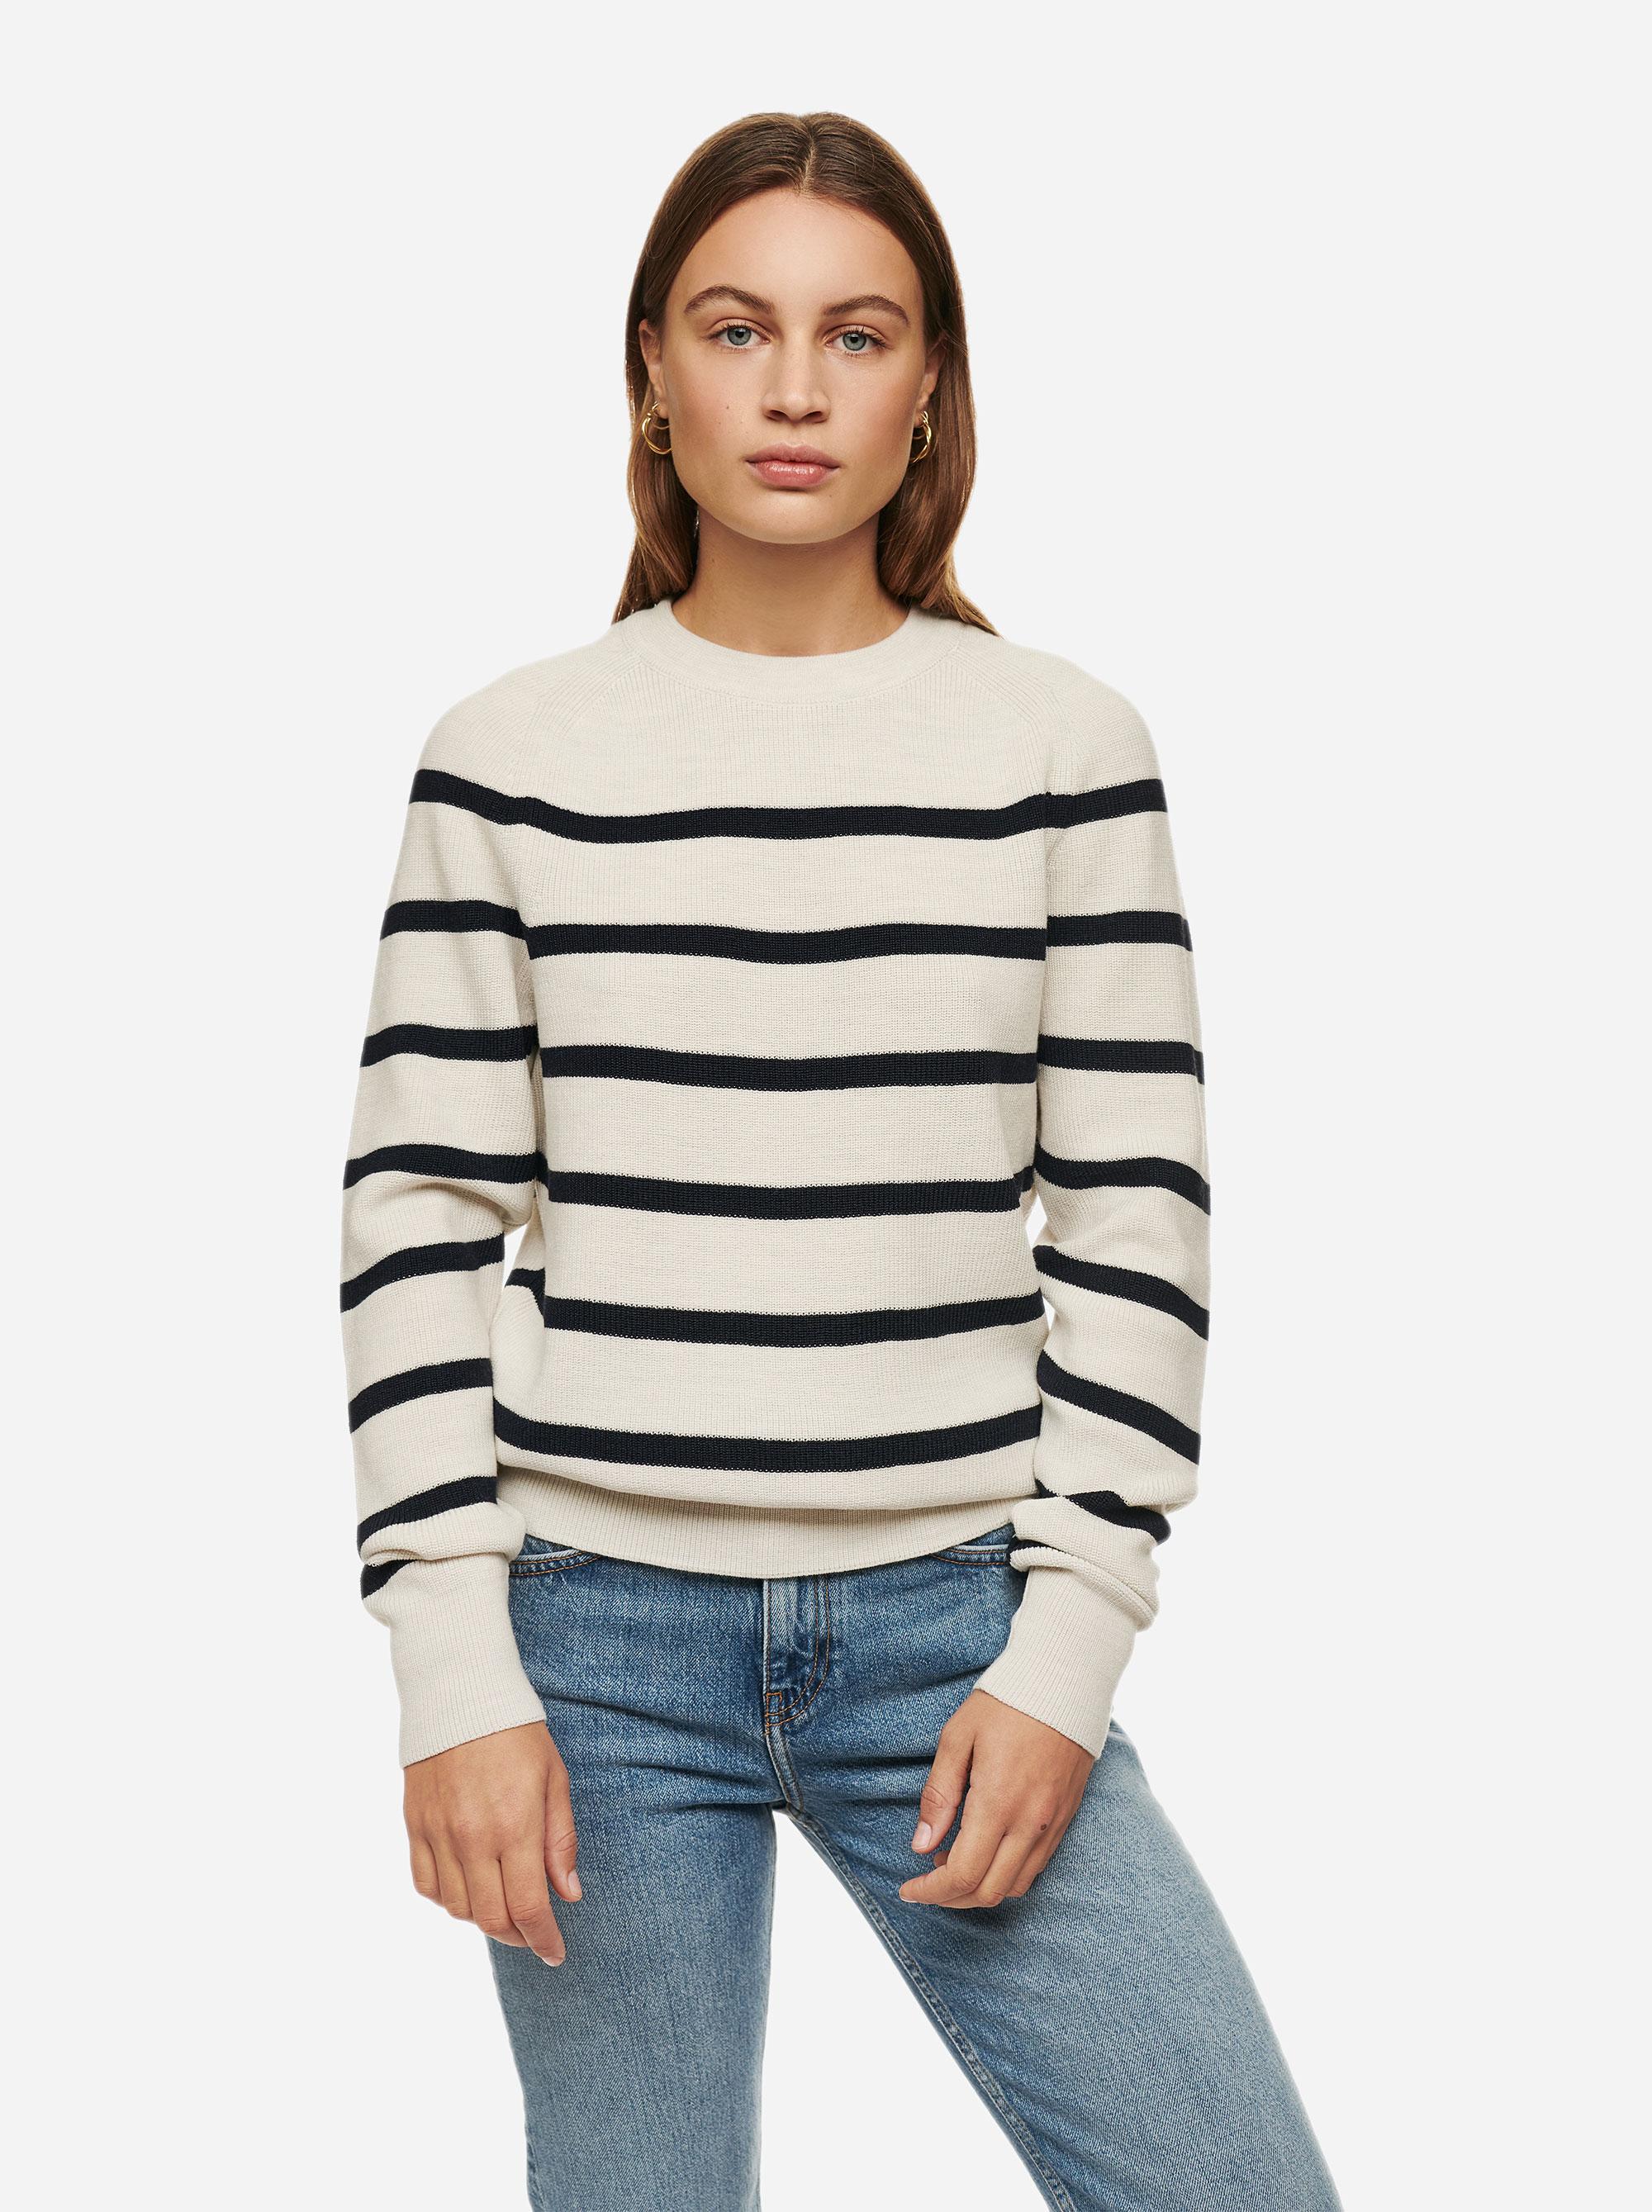 Teym - Crewneck - The Merino Sweater - Women - Striped - 3